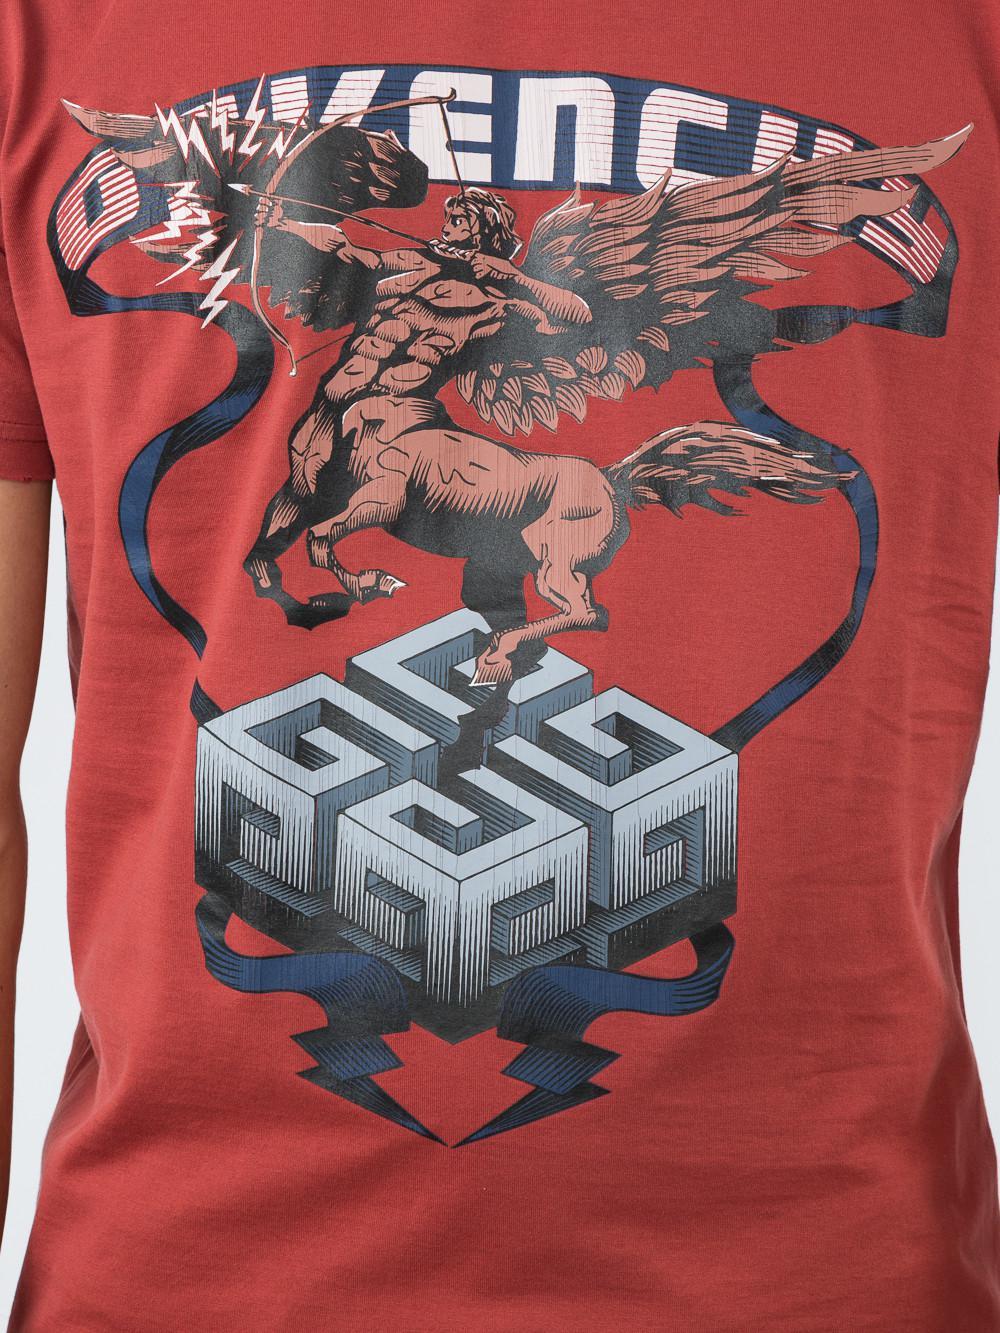 797d7a11 Givenchy Centaur Print T-shirt for Men - Lyst